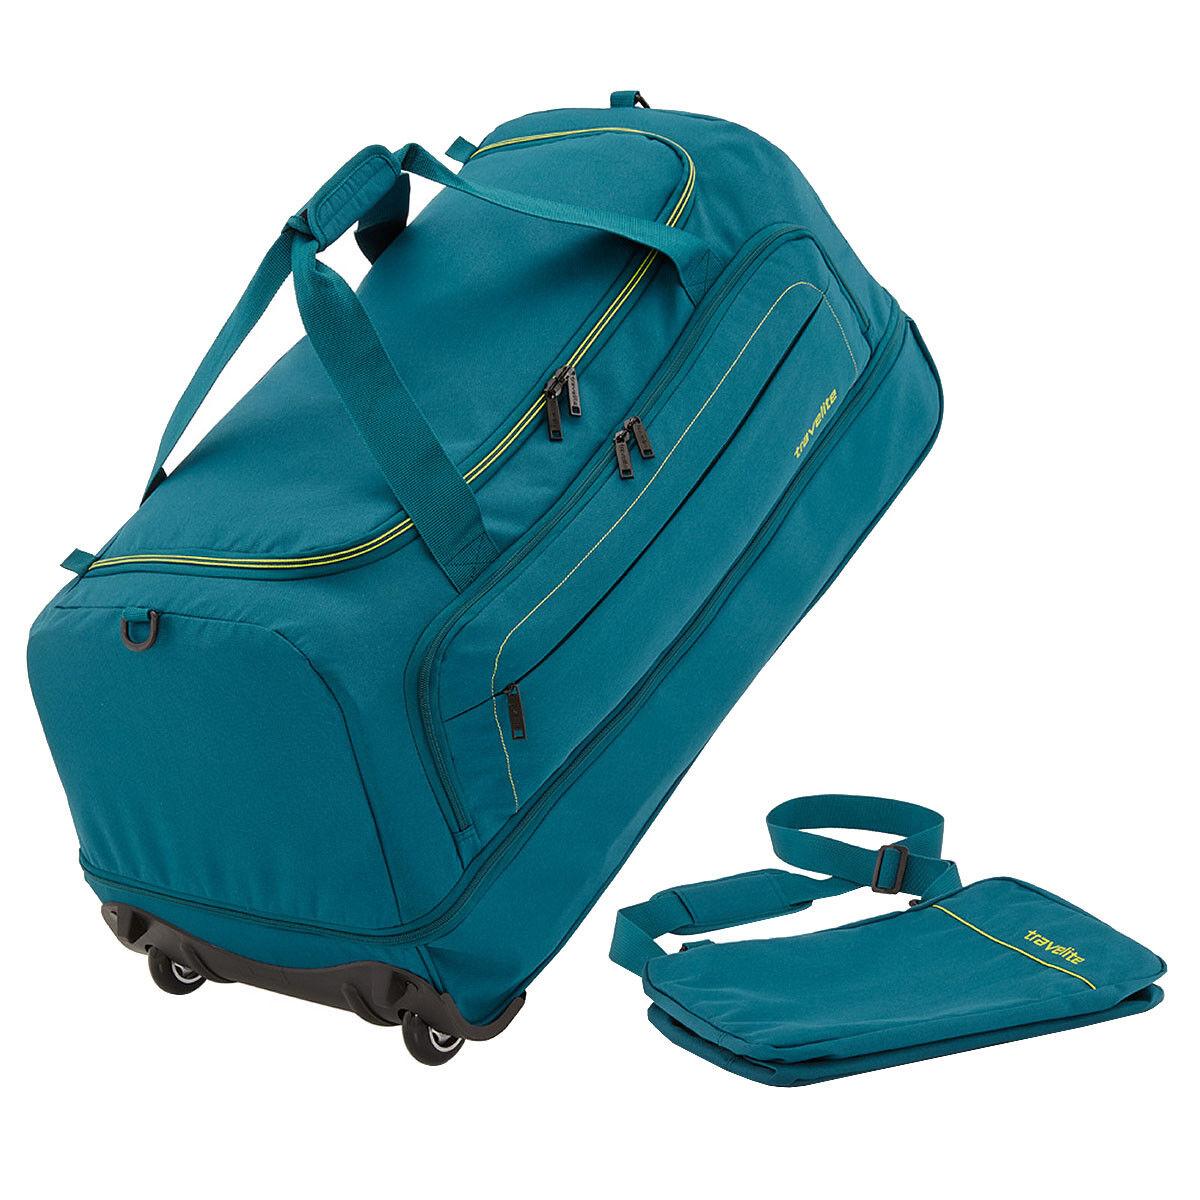 Travelite Basics faltbare Rollen Reisetasche Falttasche Duffel Trolley 1,7 kg